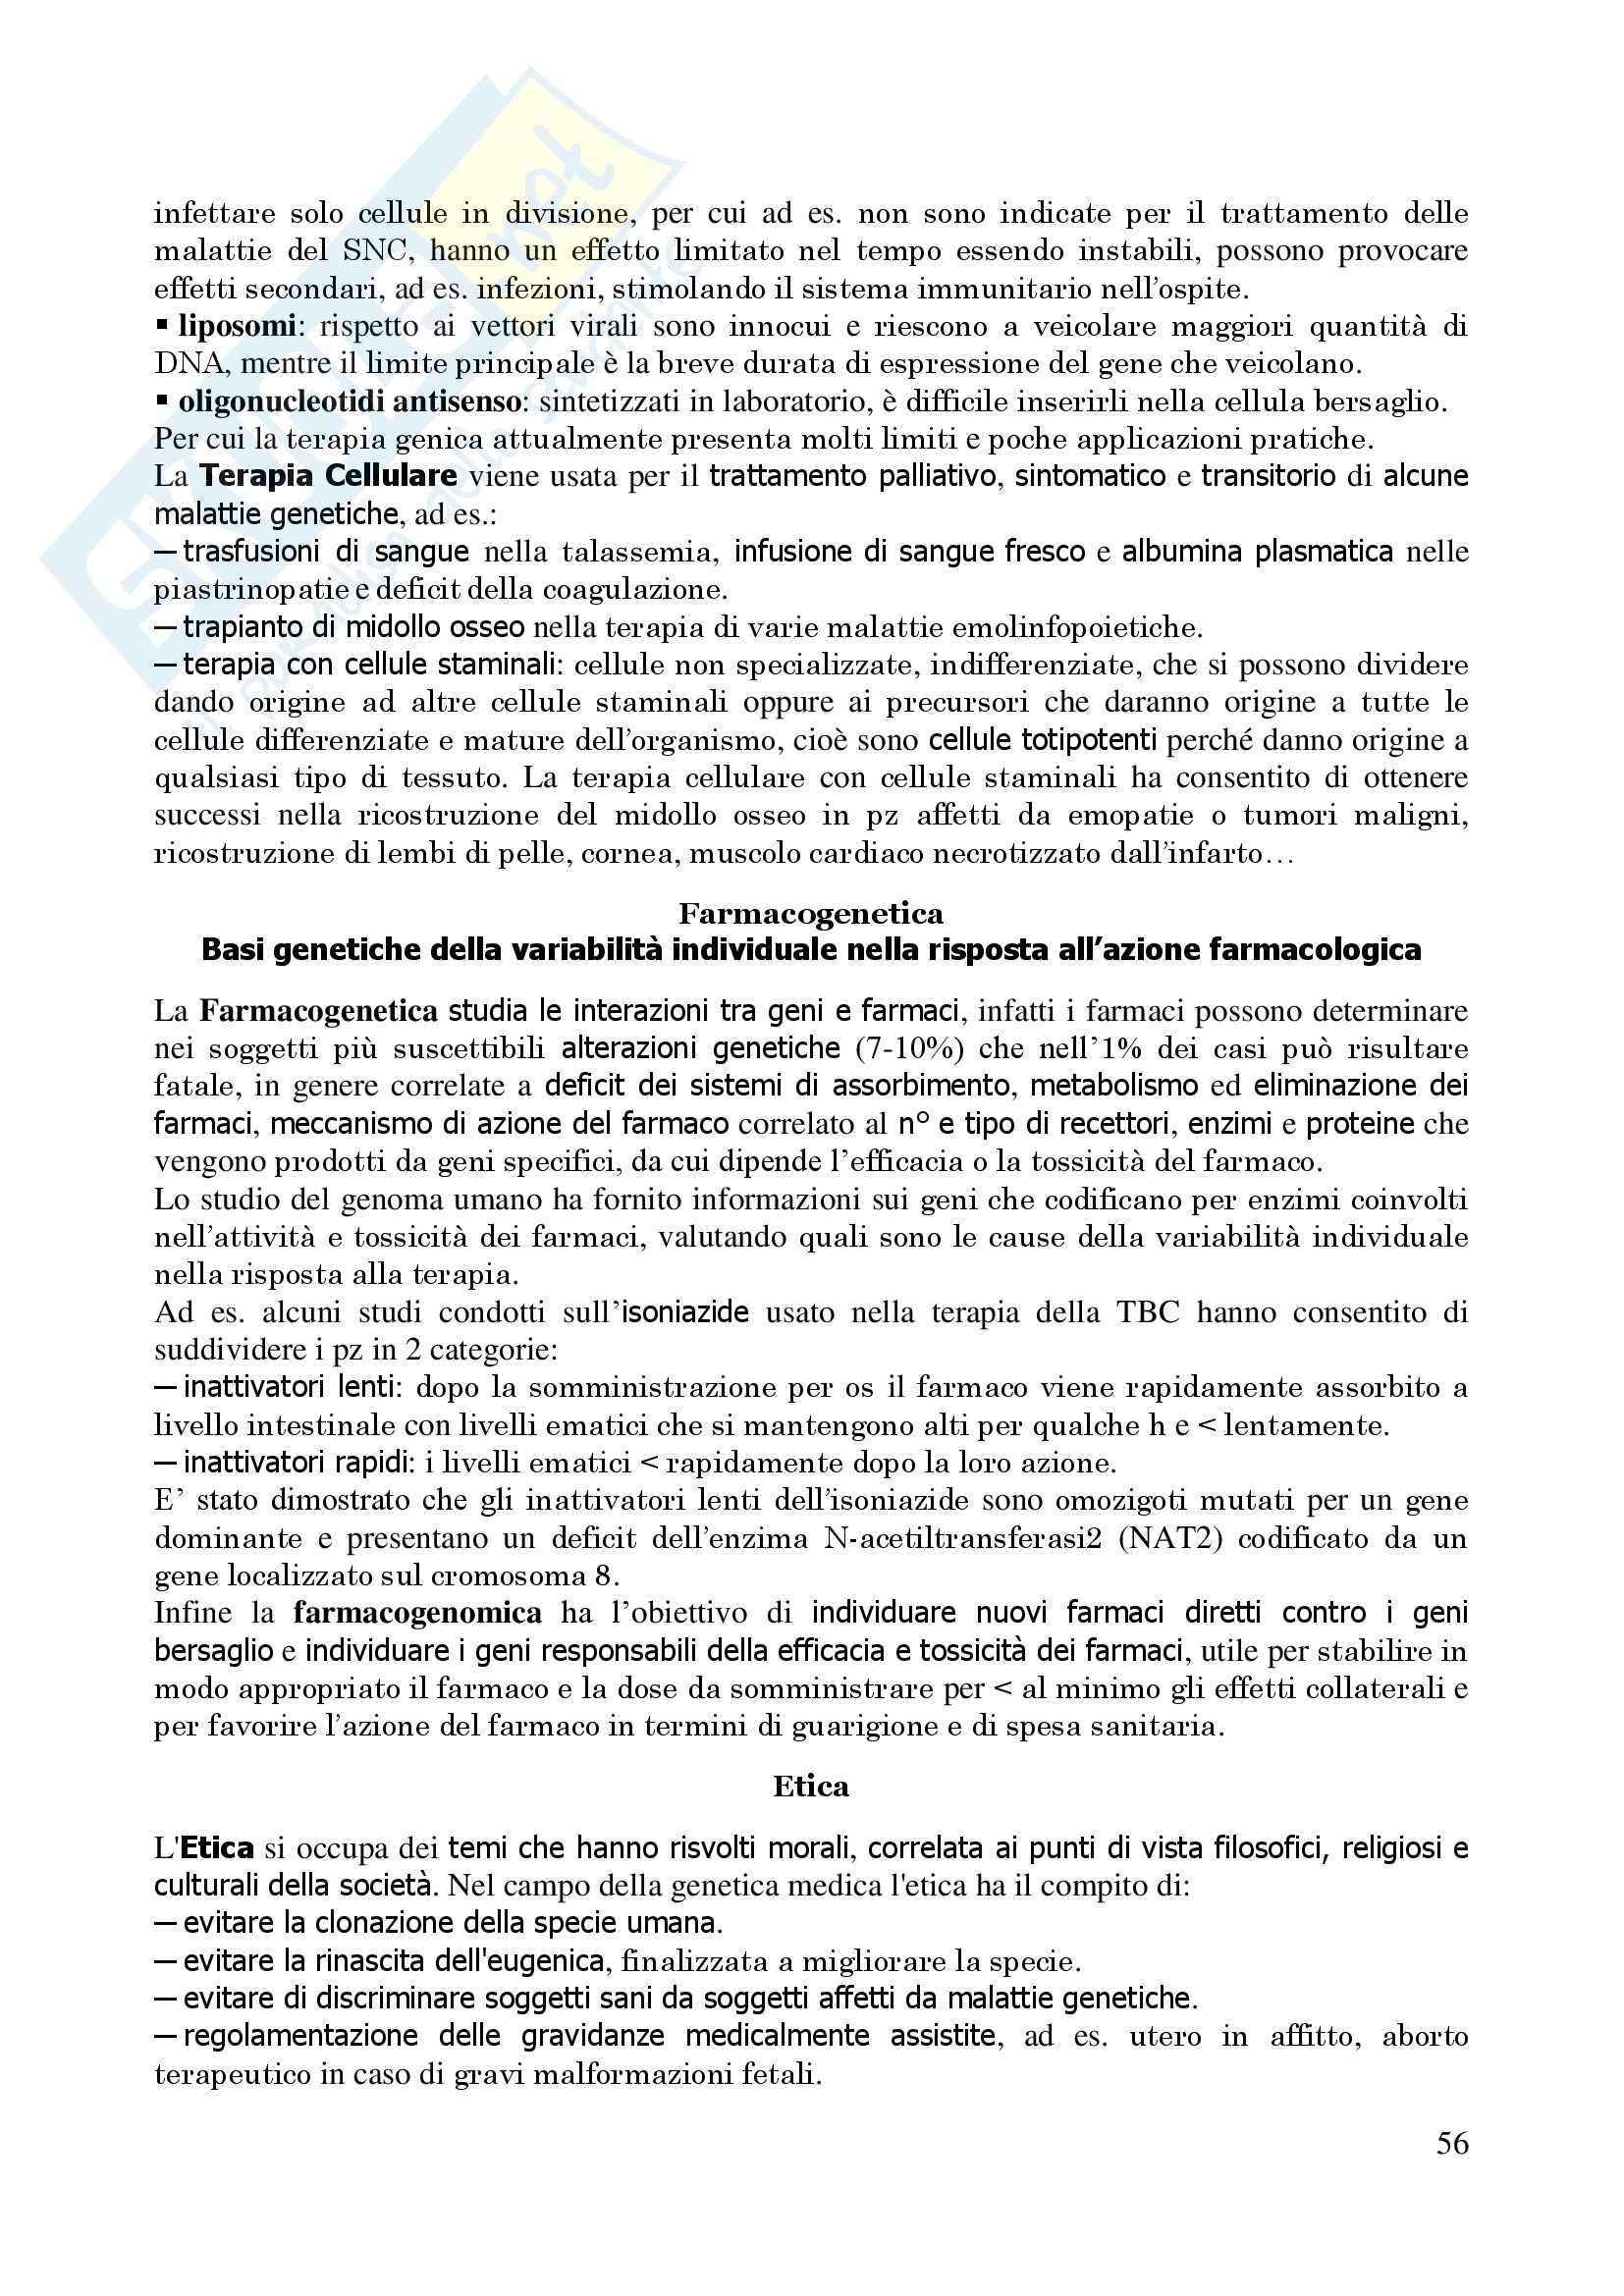 Genetica Umana - Appunti Pag. 56